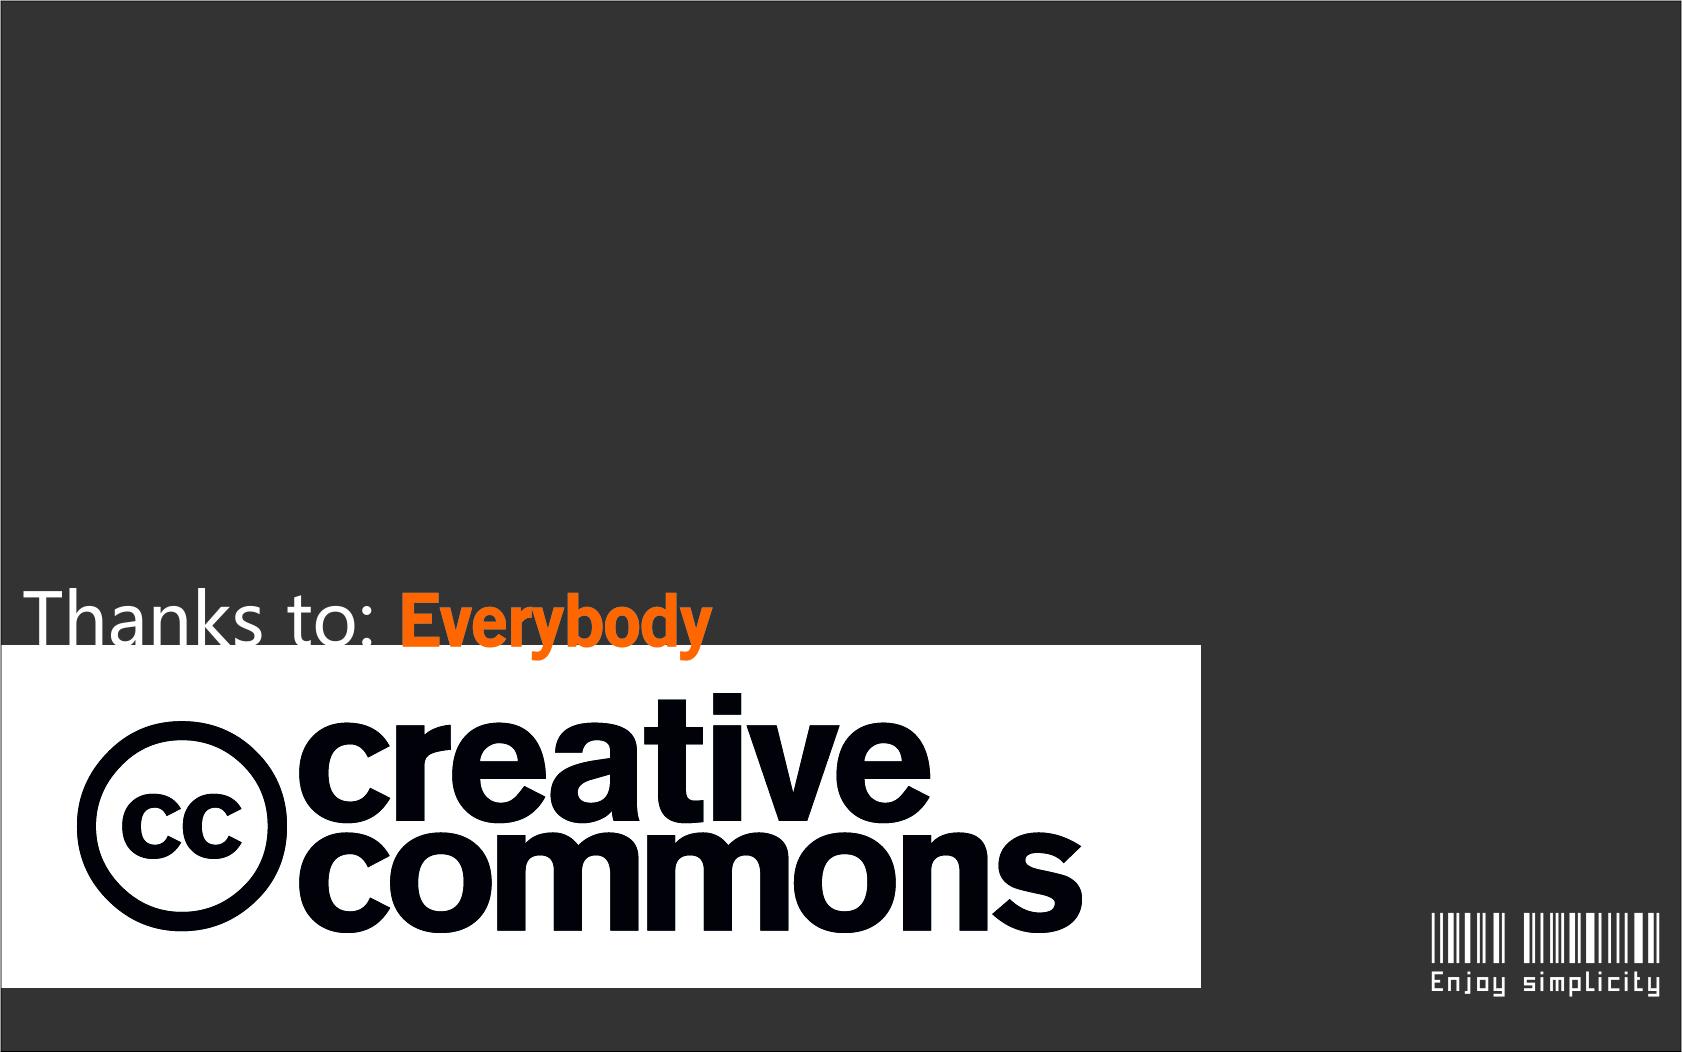 de creative commons wallpaper   ForWallpapercom 1682x1052